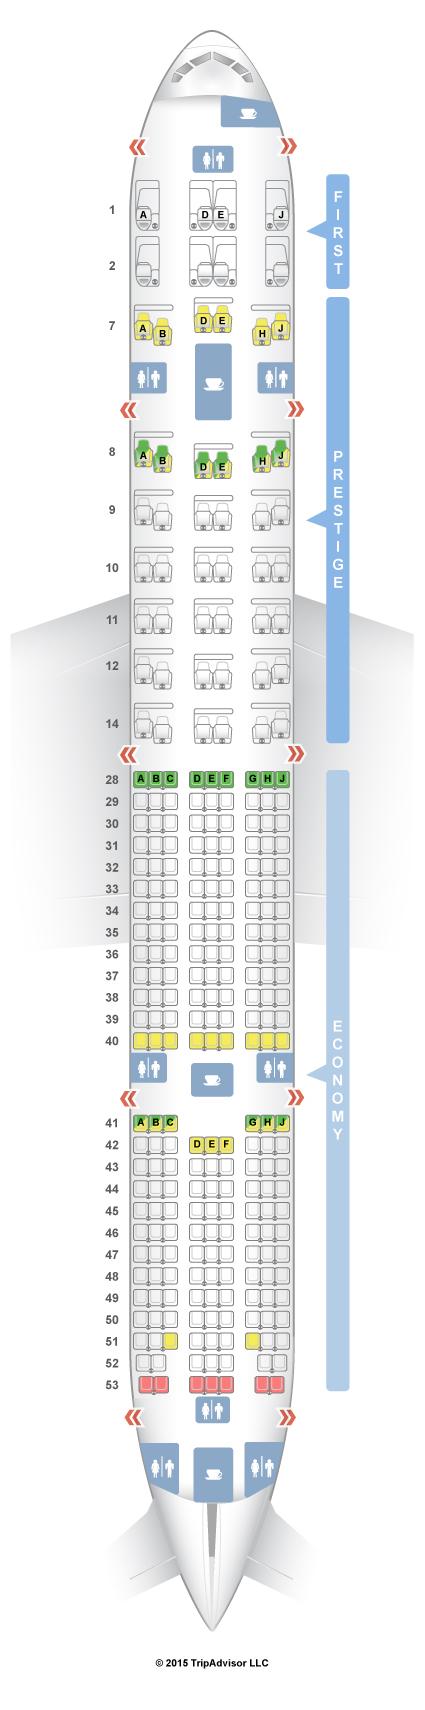 Seatguru seat map korean air boeing 777 300er 77w v1 for Plan cabine 777 300er